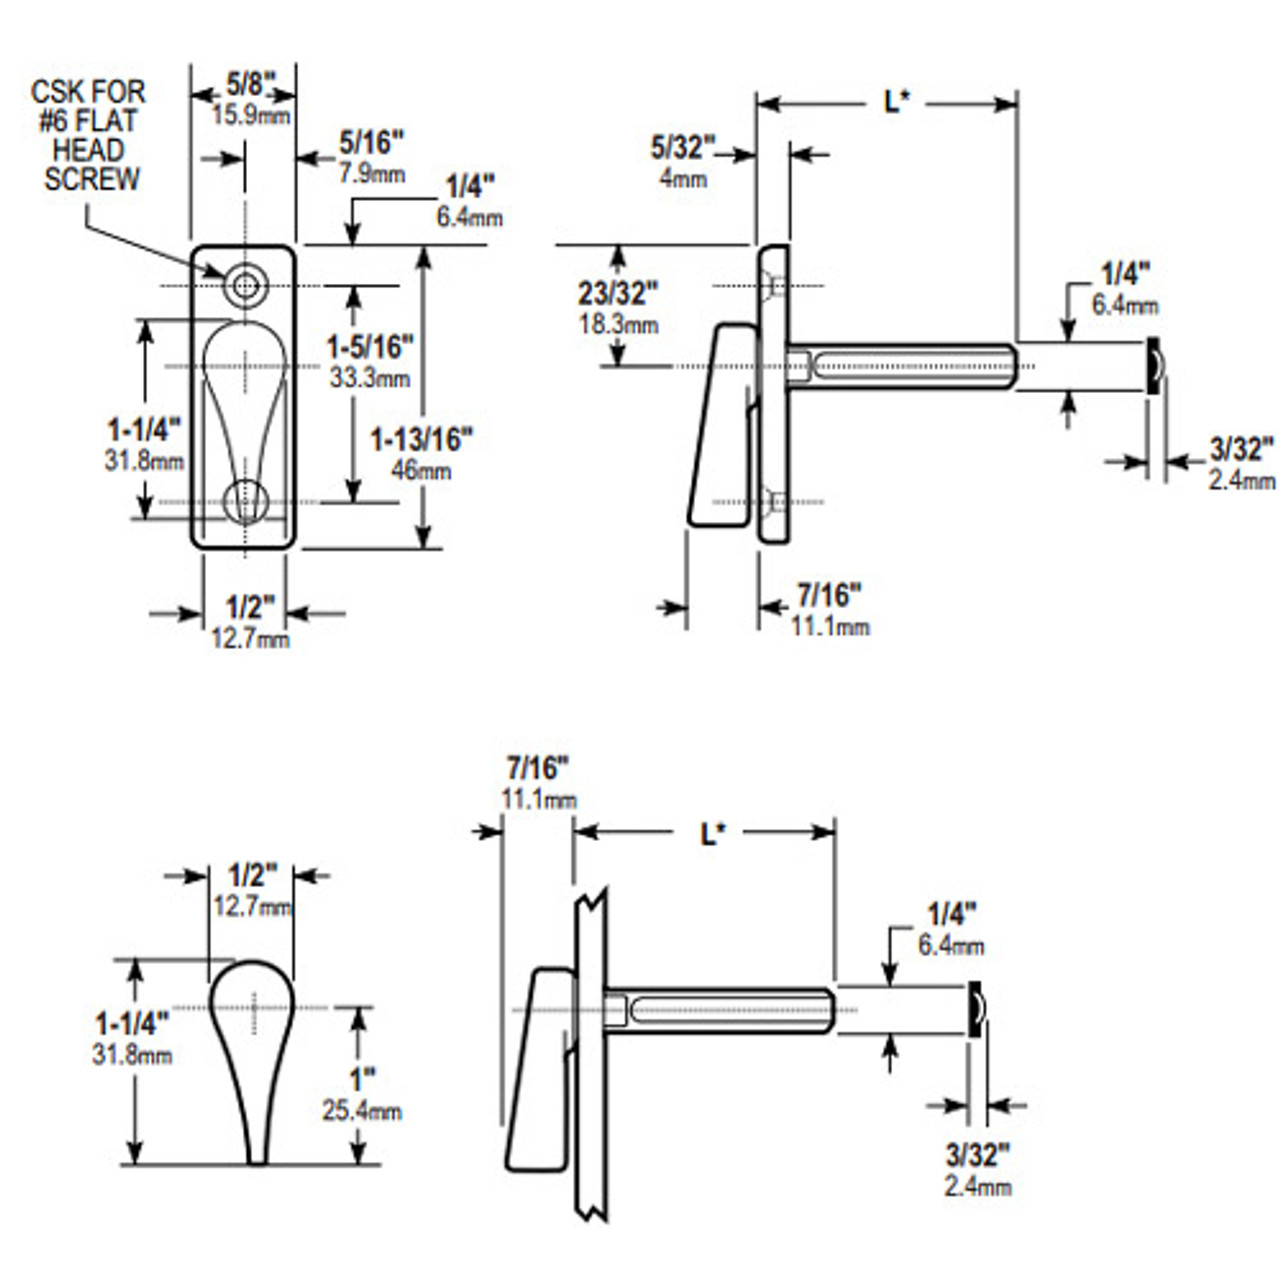 1000-11-16-121 Adams Rite 1000 Series Turns Dimensional View